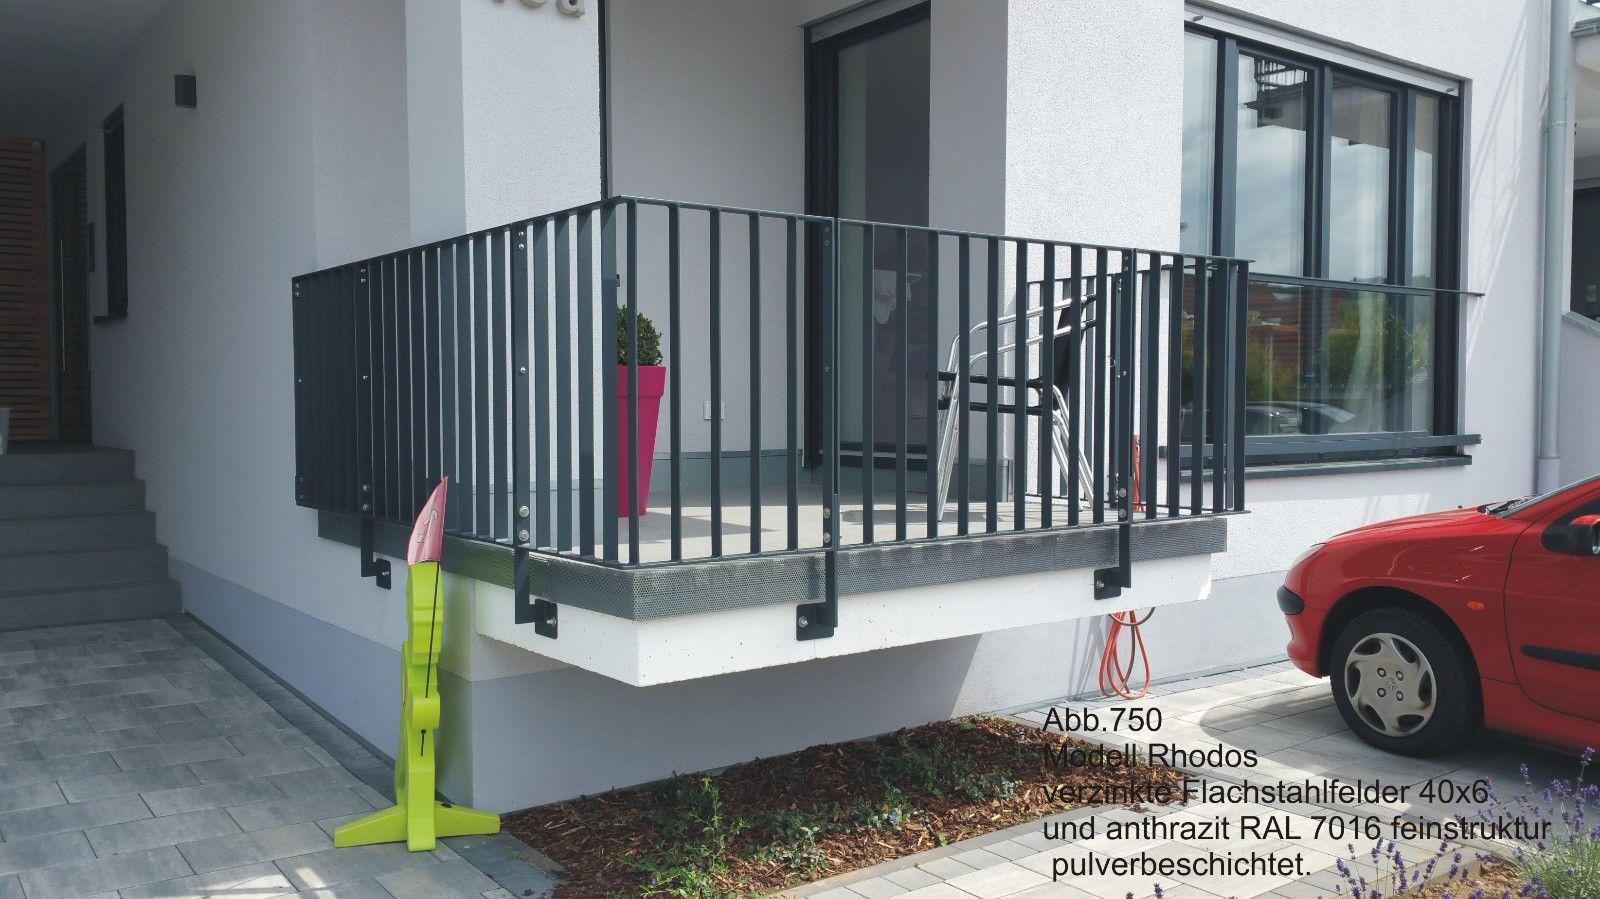 balkongel nder verzinkt flachstahl anthrazit doppelschwertpfosten eur 220 0 bemusterung. Black Bedroom Furniture Sets. Home Design Ideas